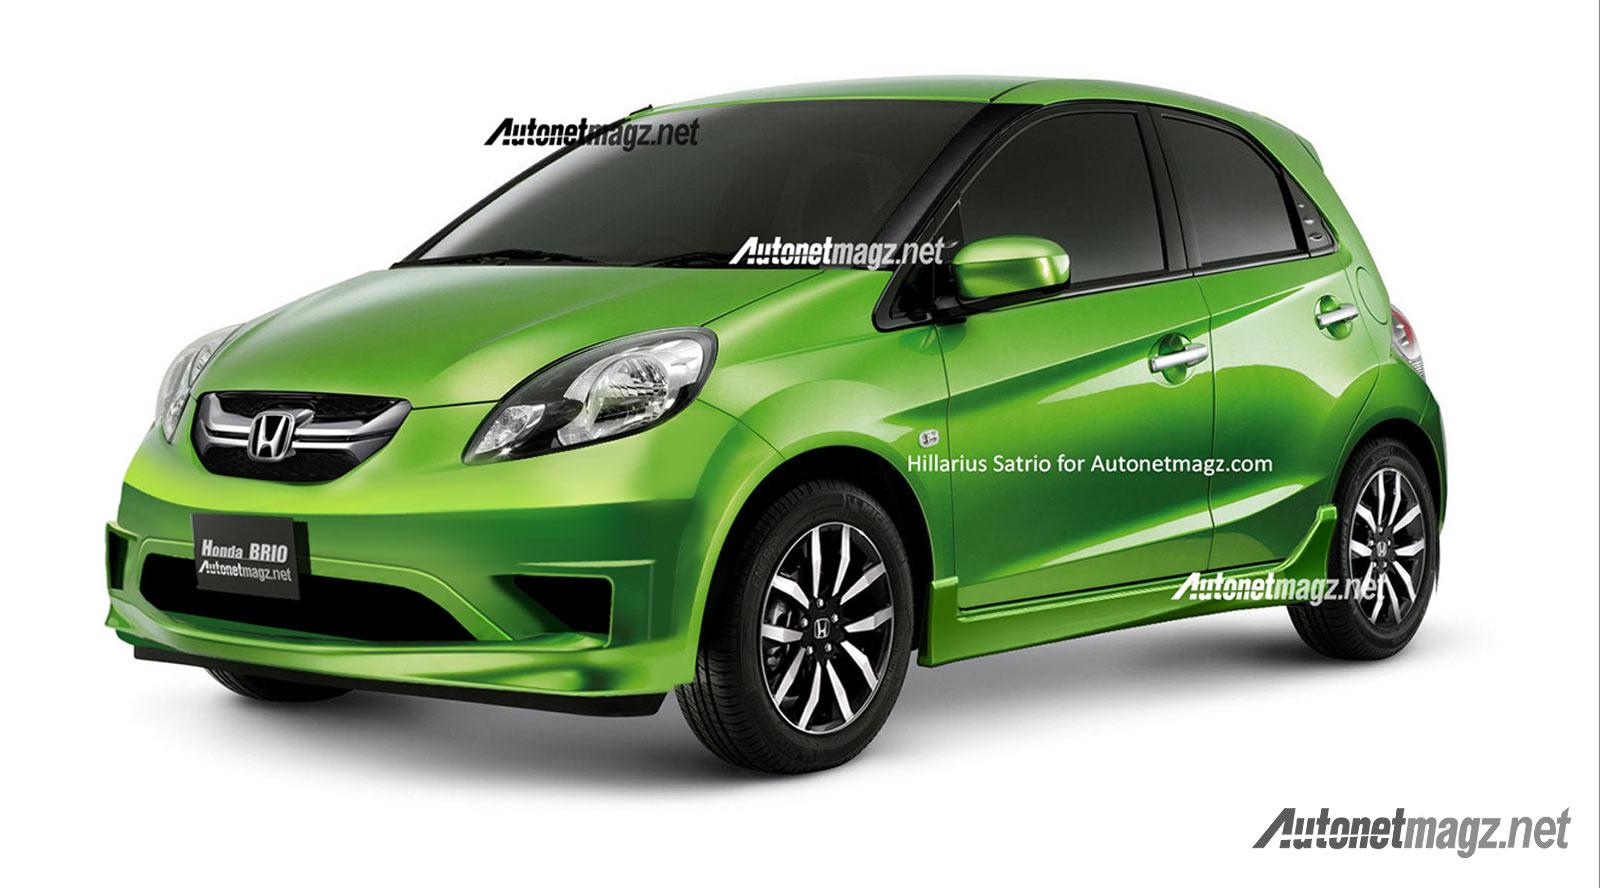 Render-Honda-Brio-Facelift-2015-by-AutonetMagz